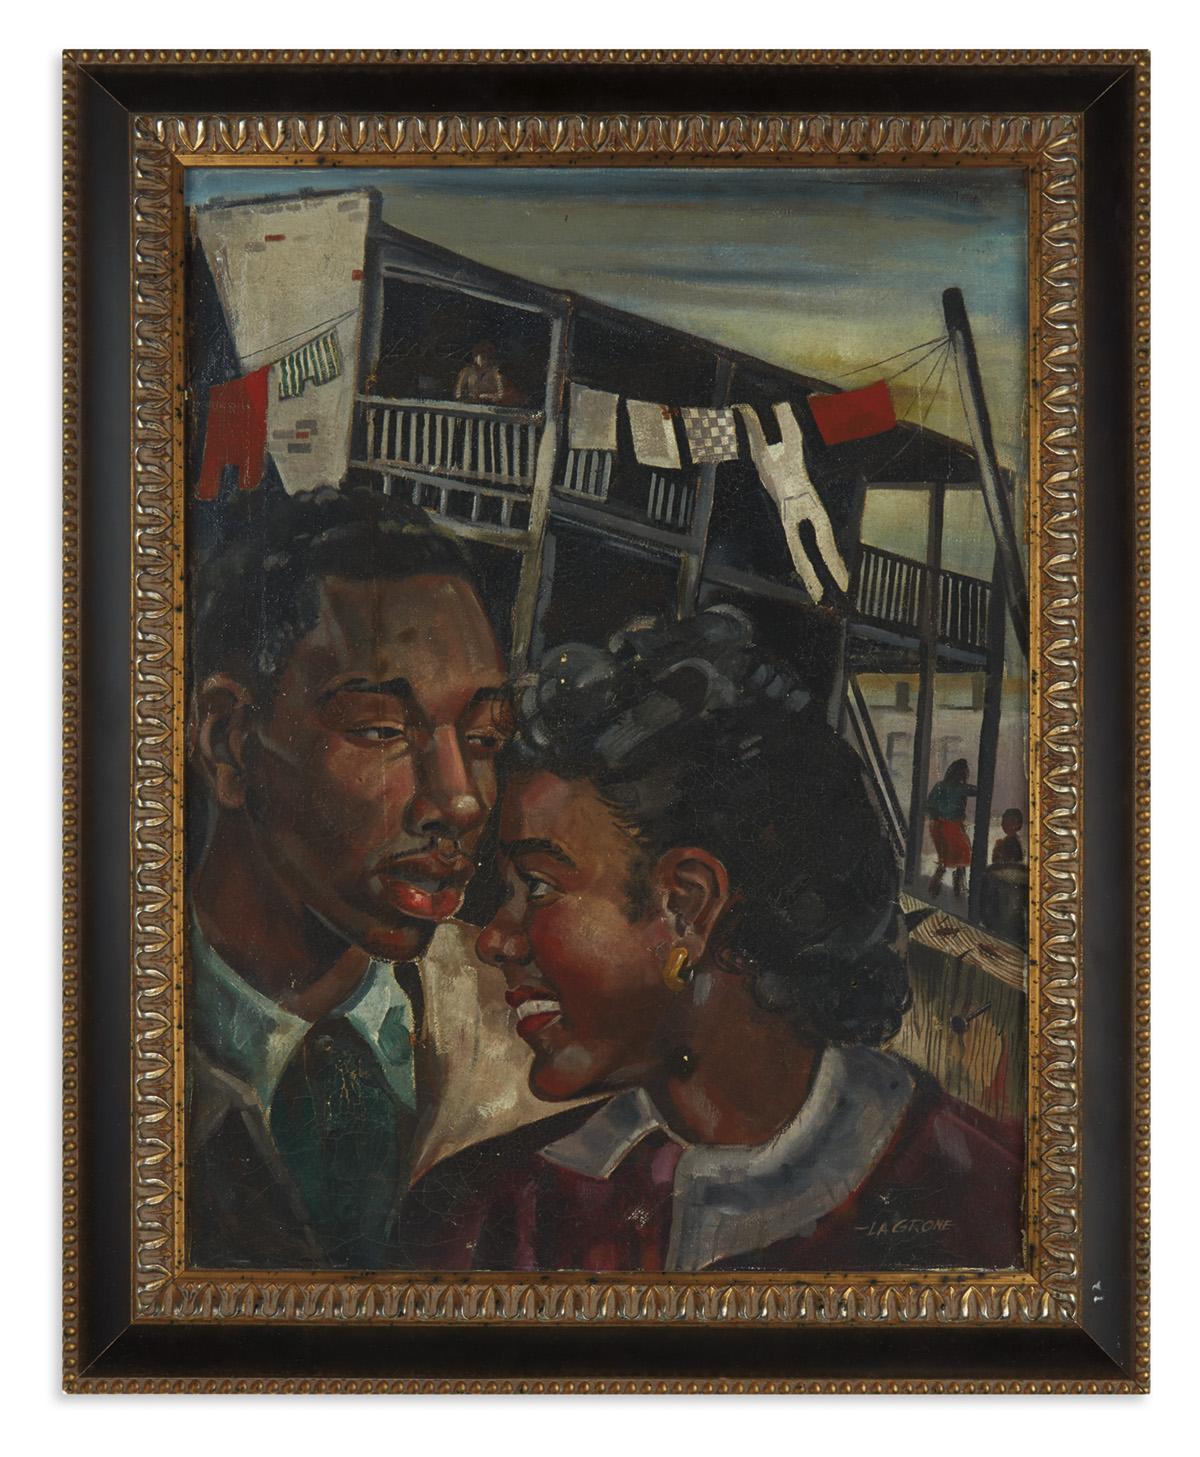 (ART.) LaGrone, Roy. The Tenement Lovers.